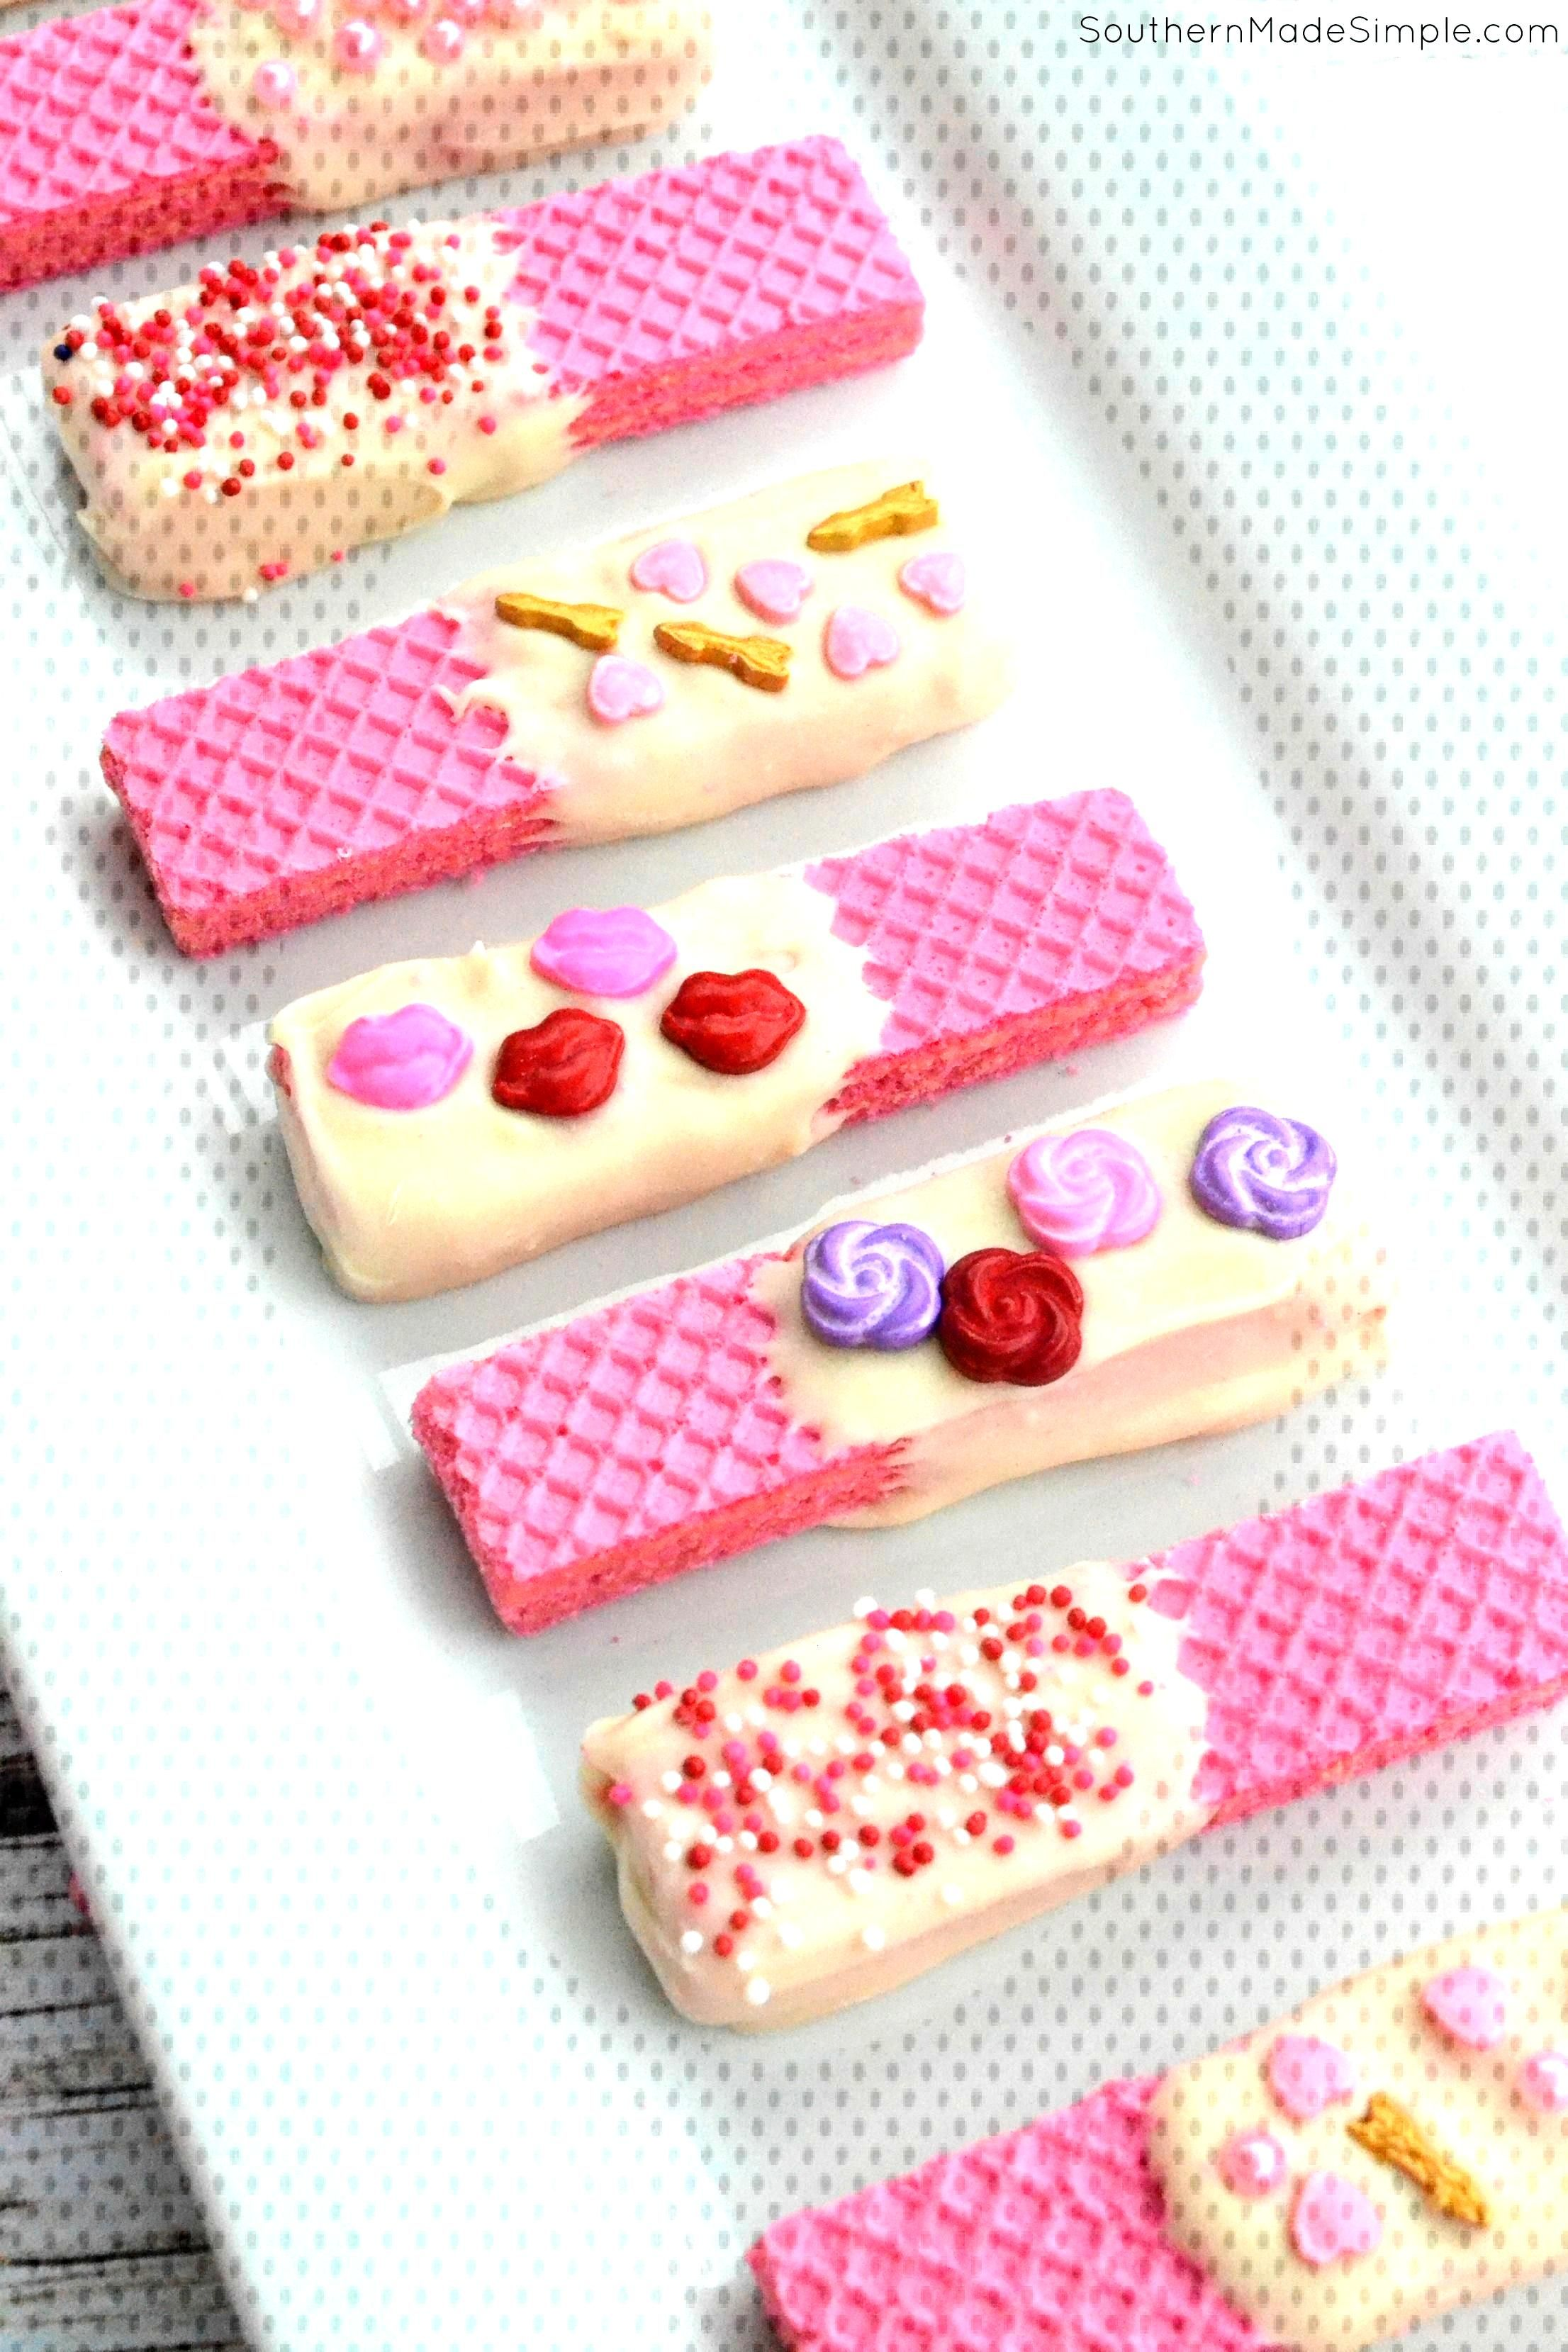 Strawberry Valentine Sugar Wafers - Southern Made Simple Strawberry Valentine Sugar Wafers - Southe